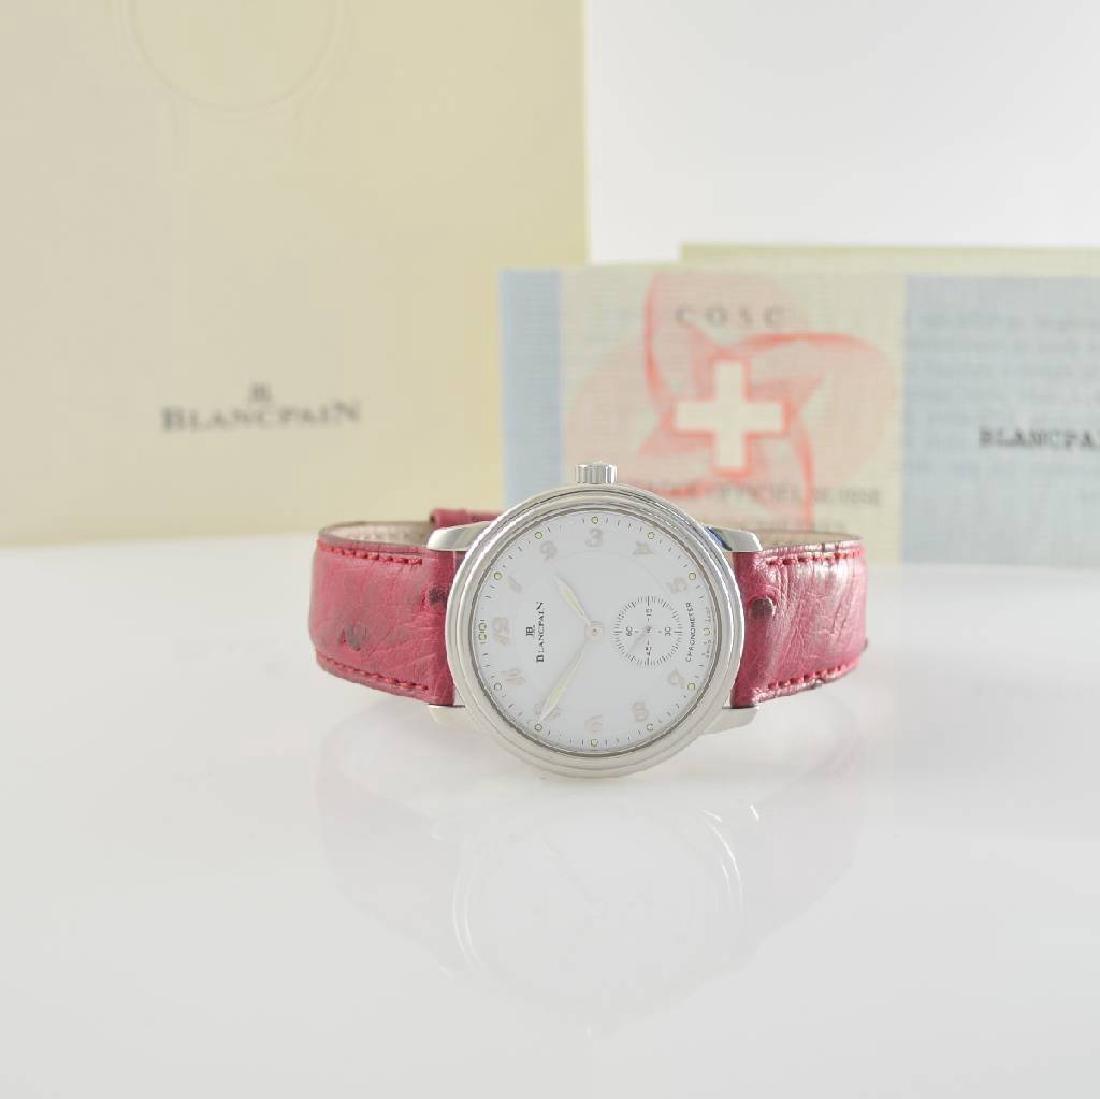 BLANCPAIN chronometer rare gents wristwatch